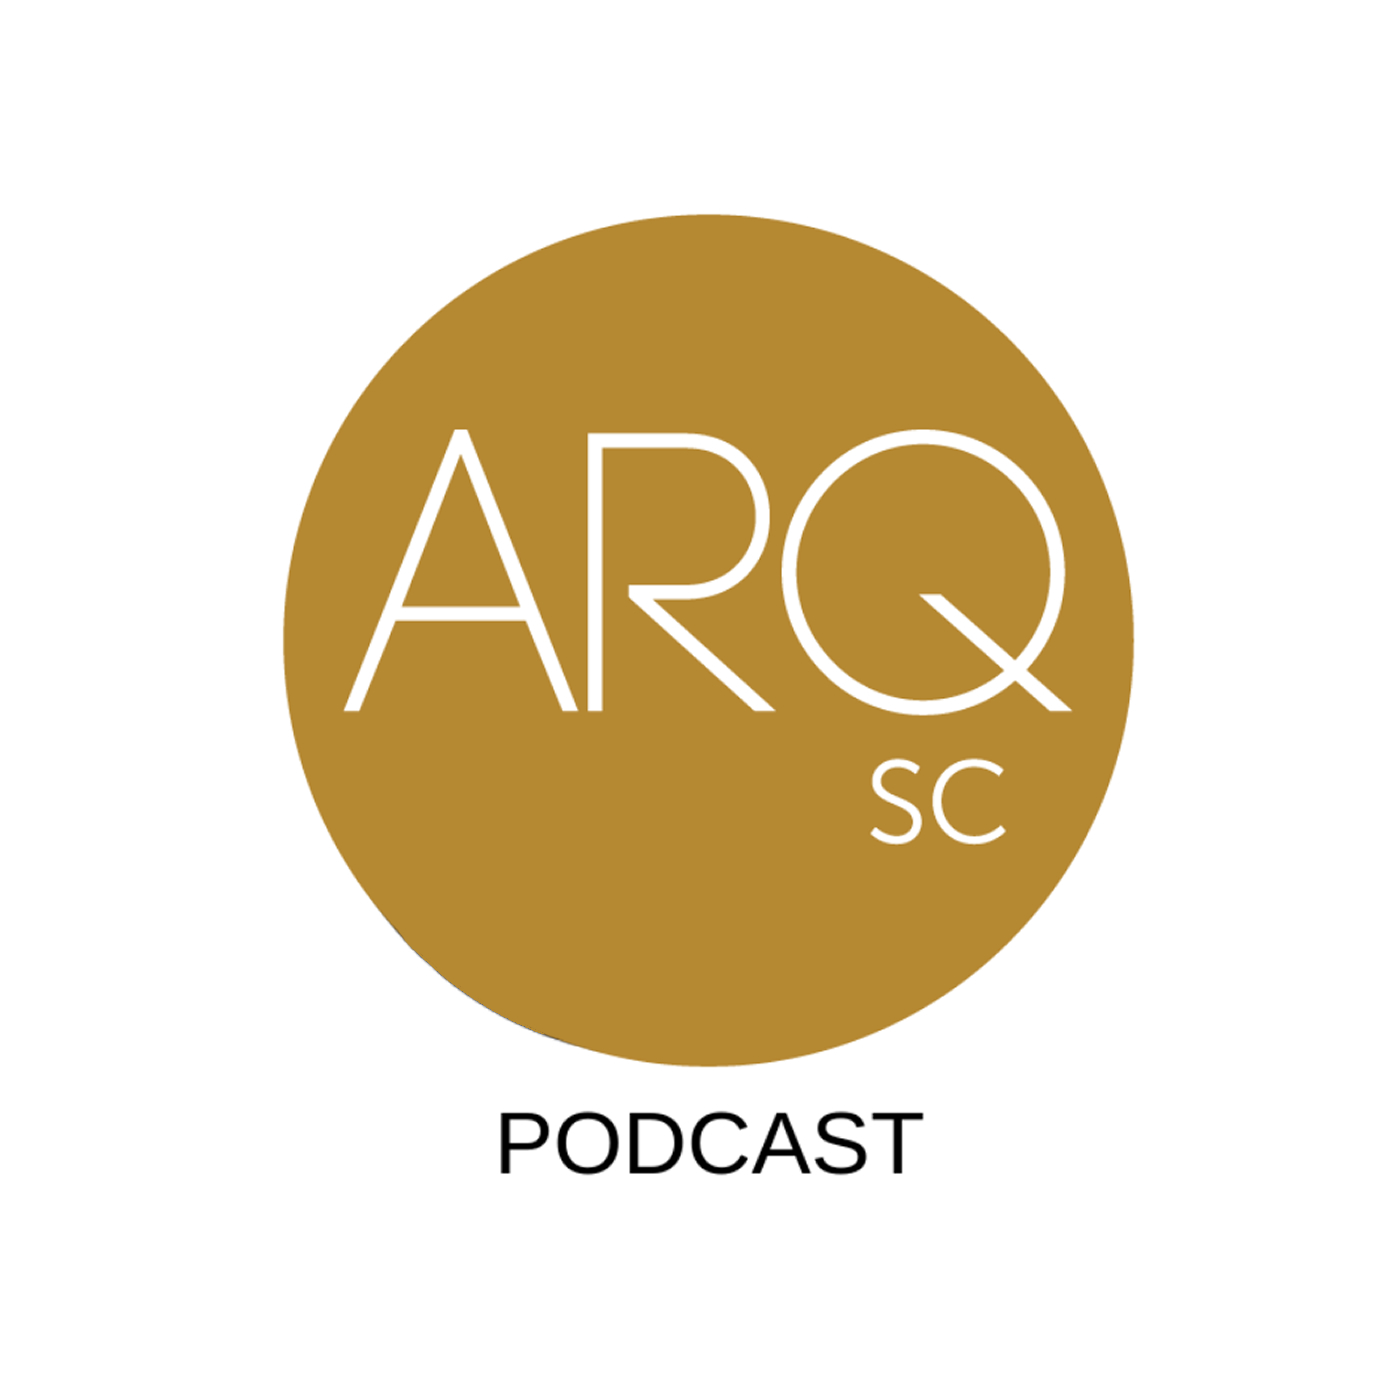 Imagem do ArqSC podcast